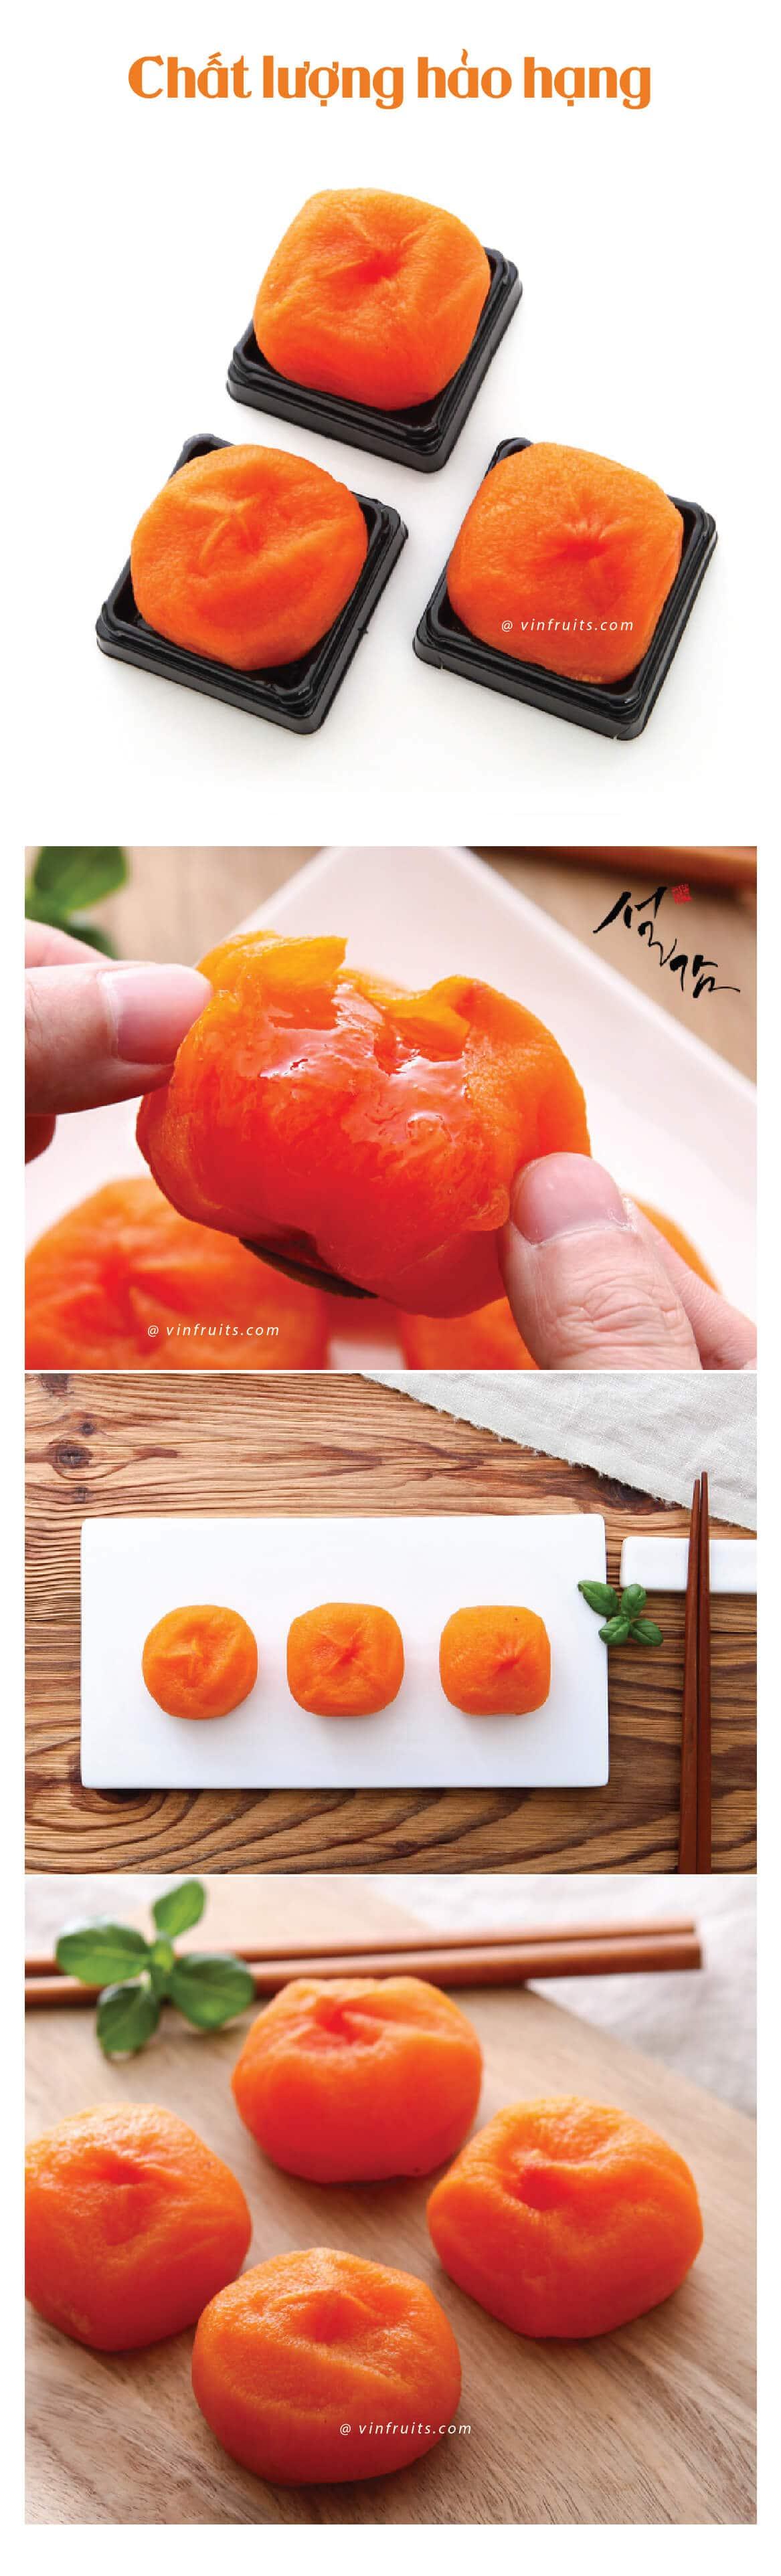 Hong mot nang Han Quoc - vinfruits.com 5